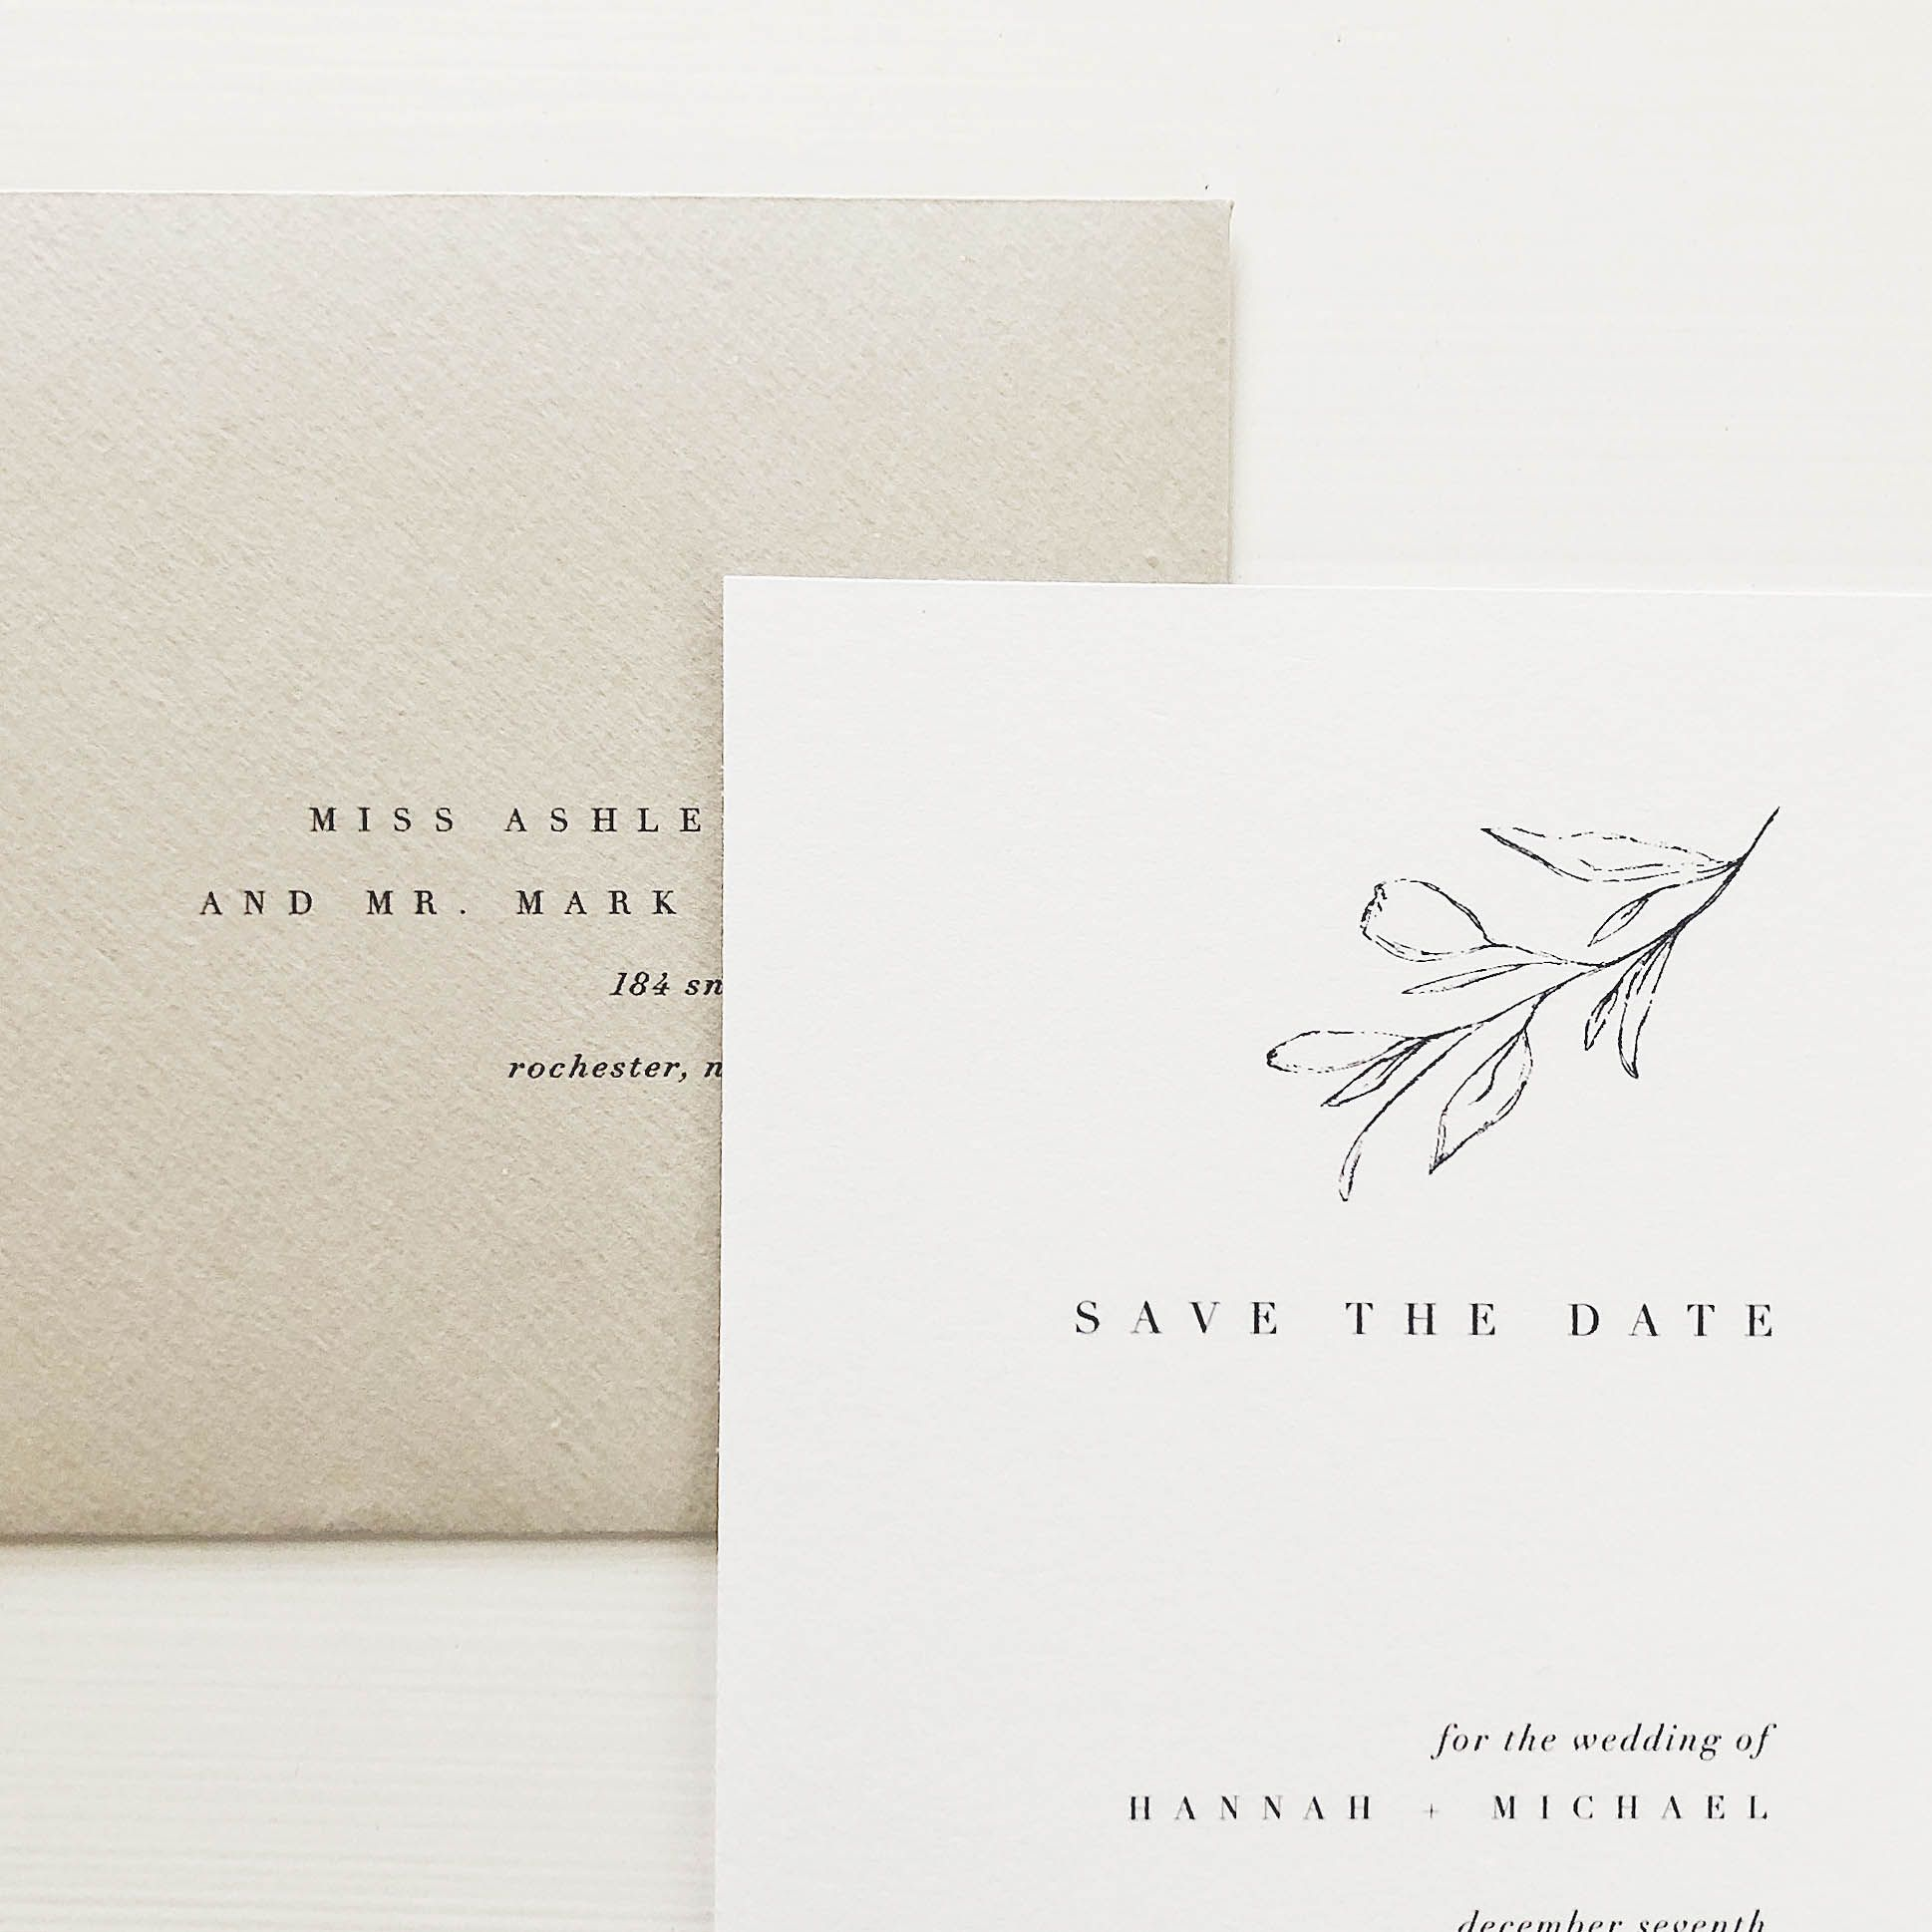 Fine Art Save The Dates Handmade Paper Save The Dates Letterpress Save The Dates Ca Letterpress Save The Dates Wedding Stationery Letterpress Invitations